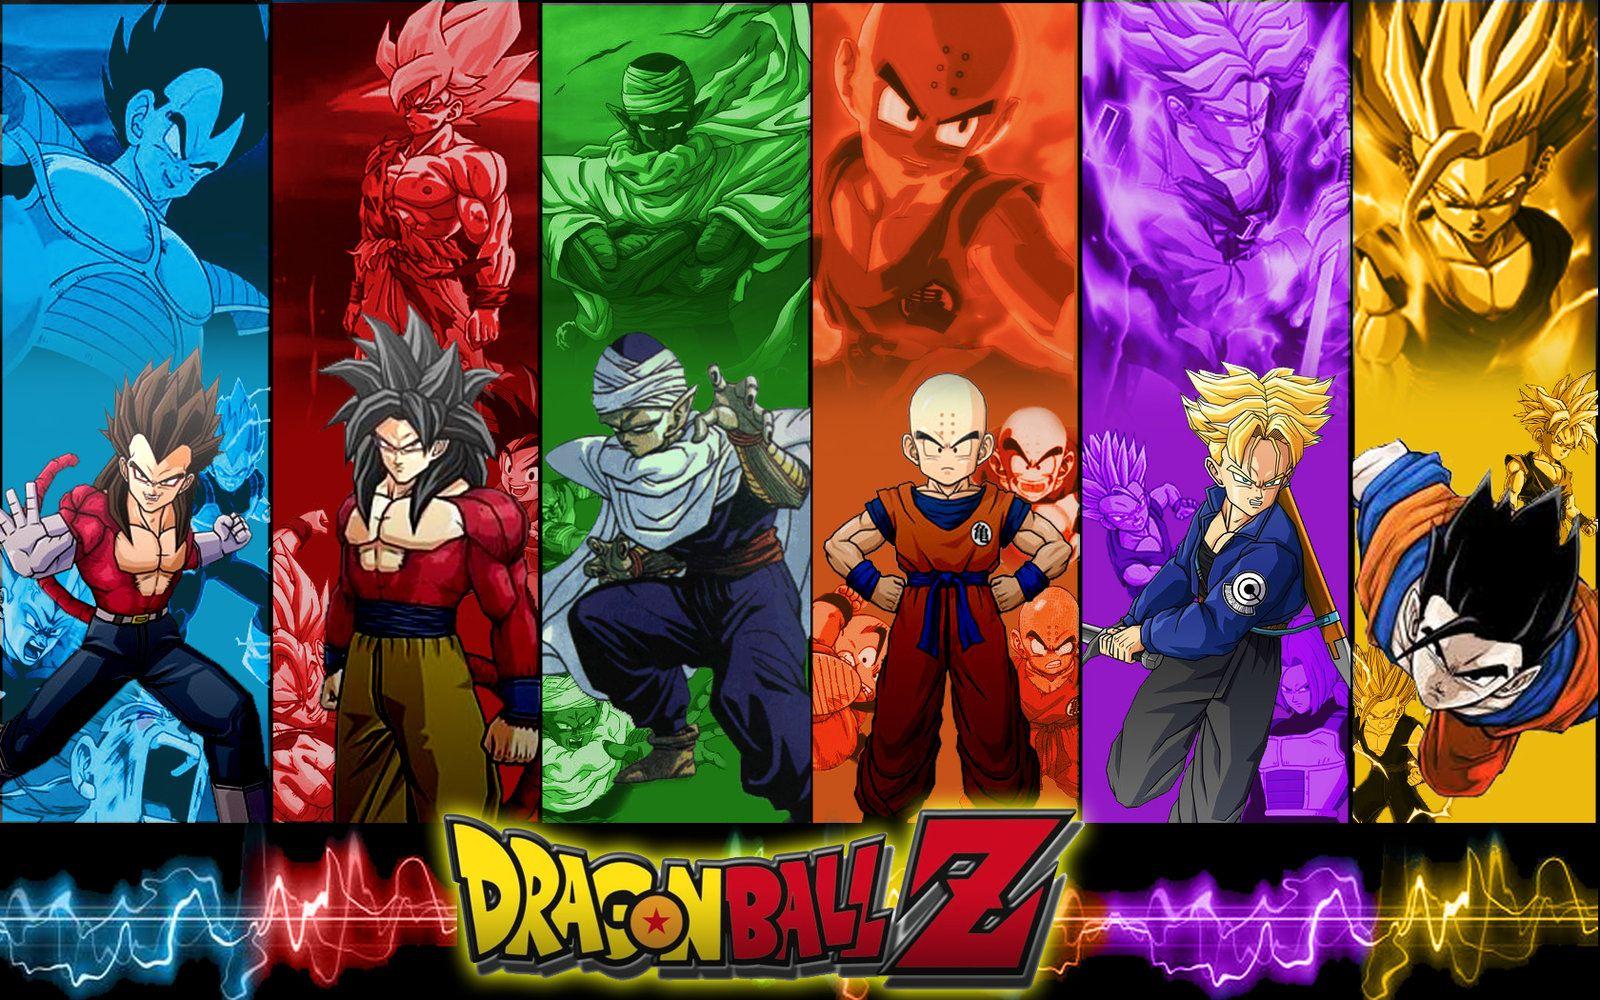 Google chrome themes dragon ball z - Dragonball Z By Photshopmaniac Deviantart Com On Deviantart